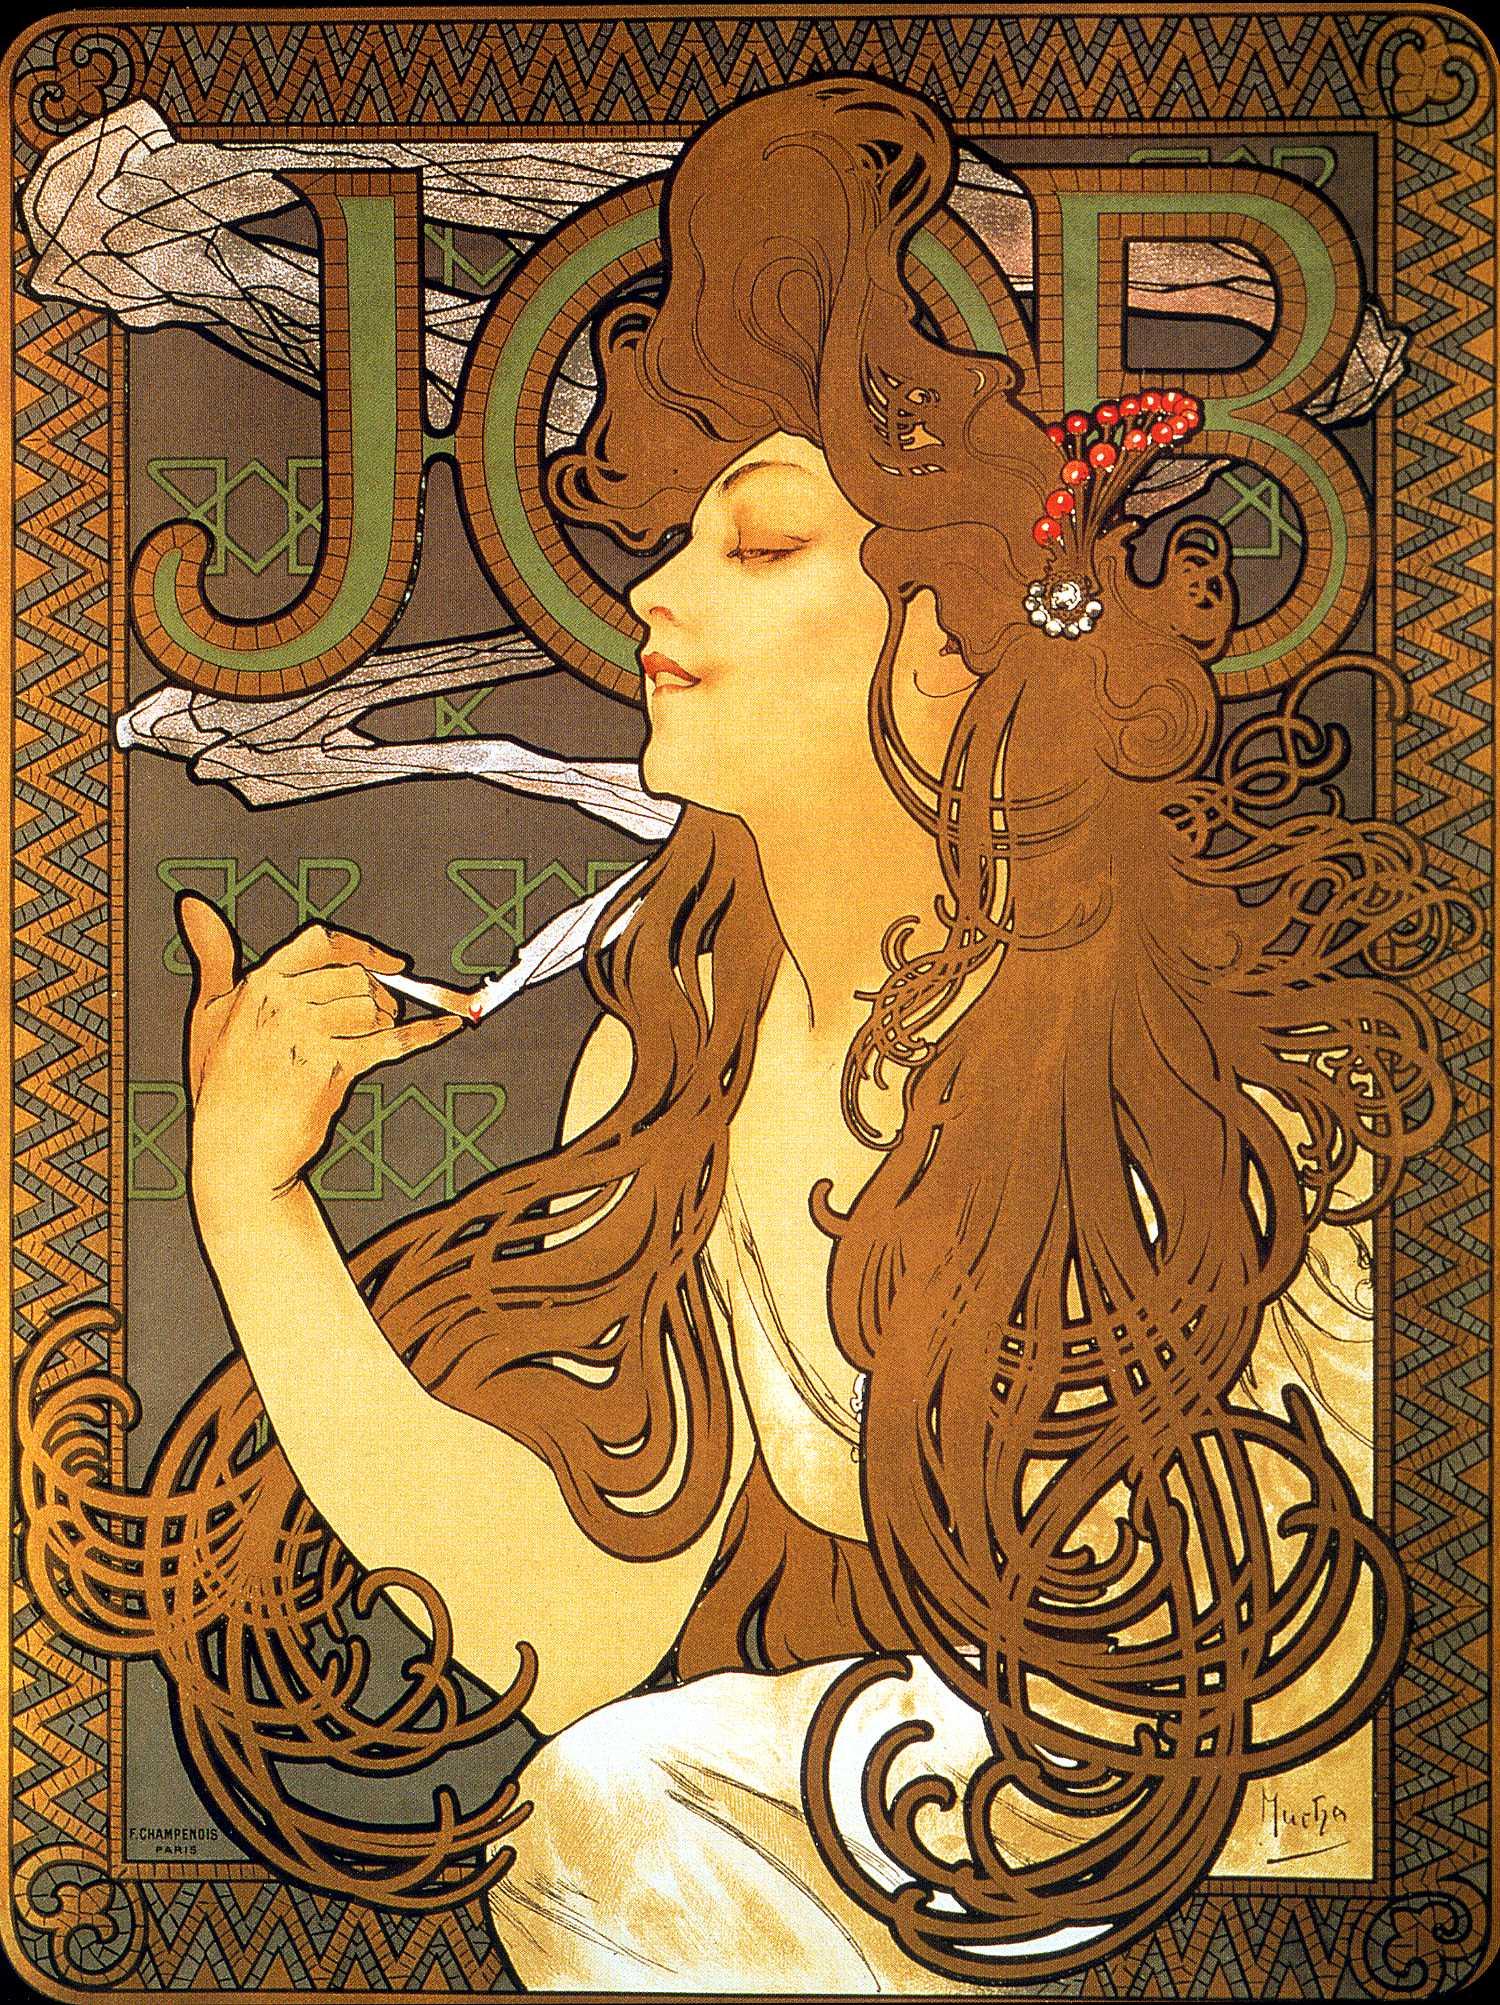 3. job-1896